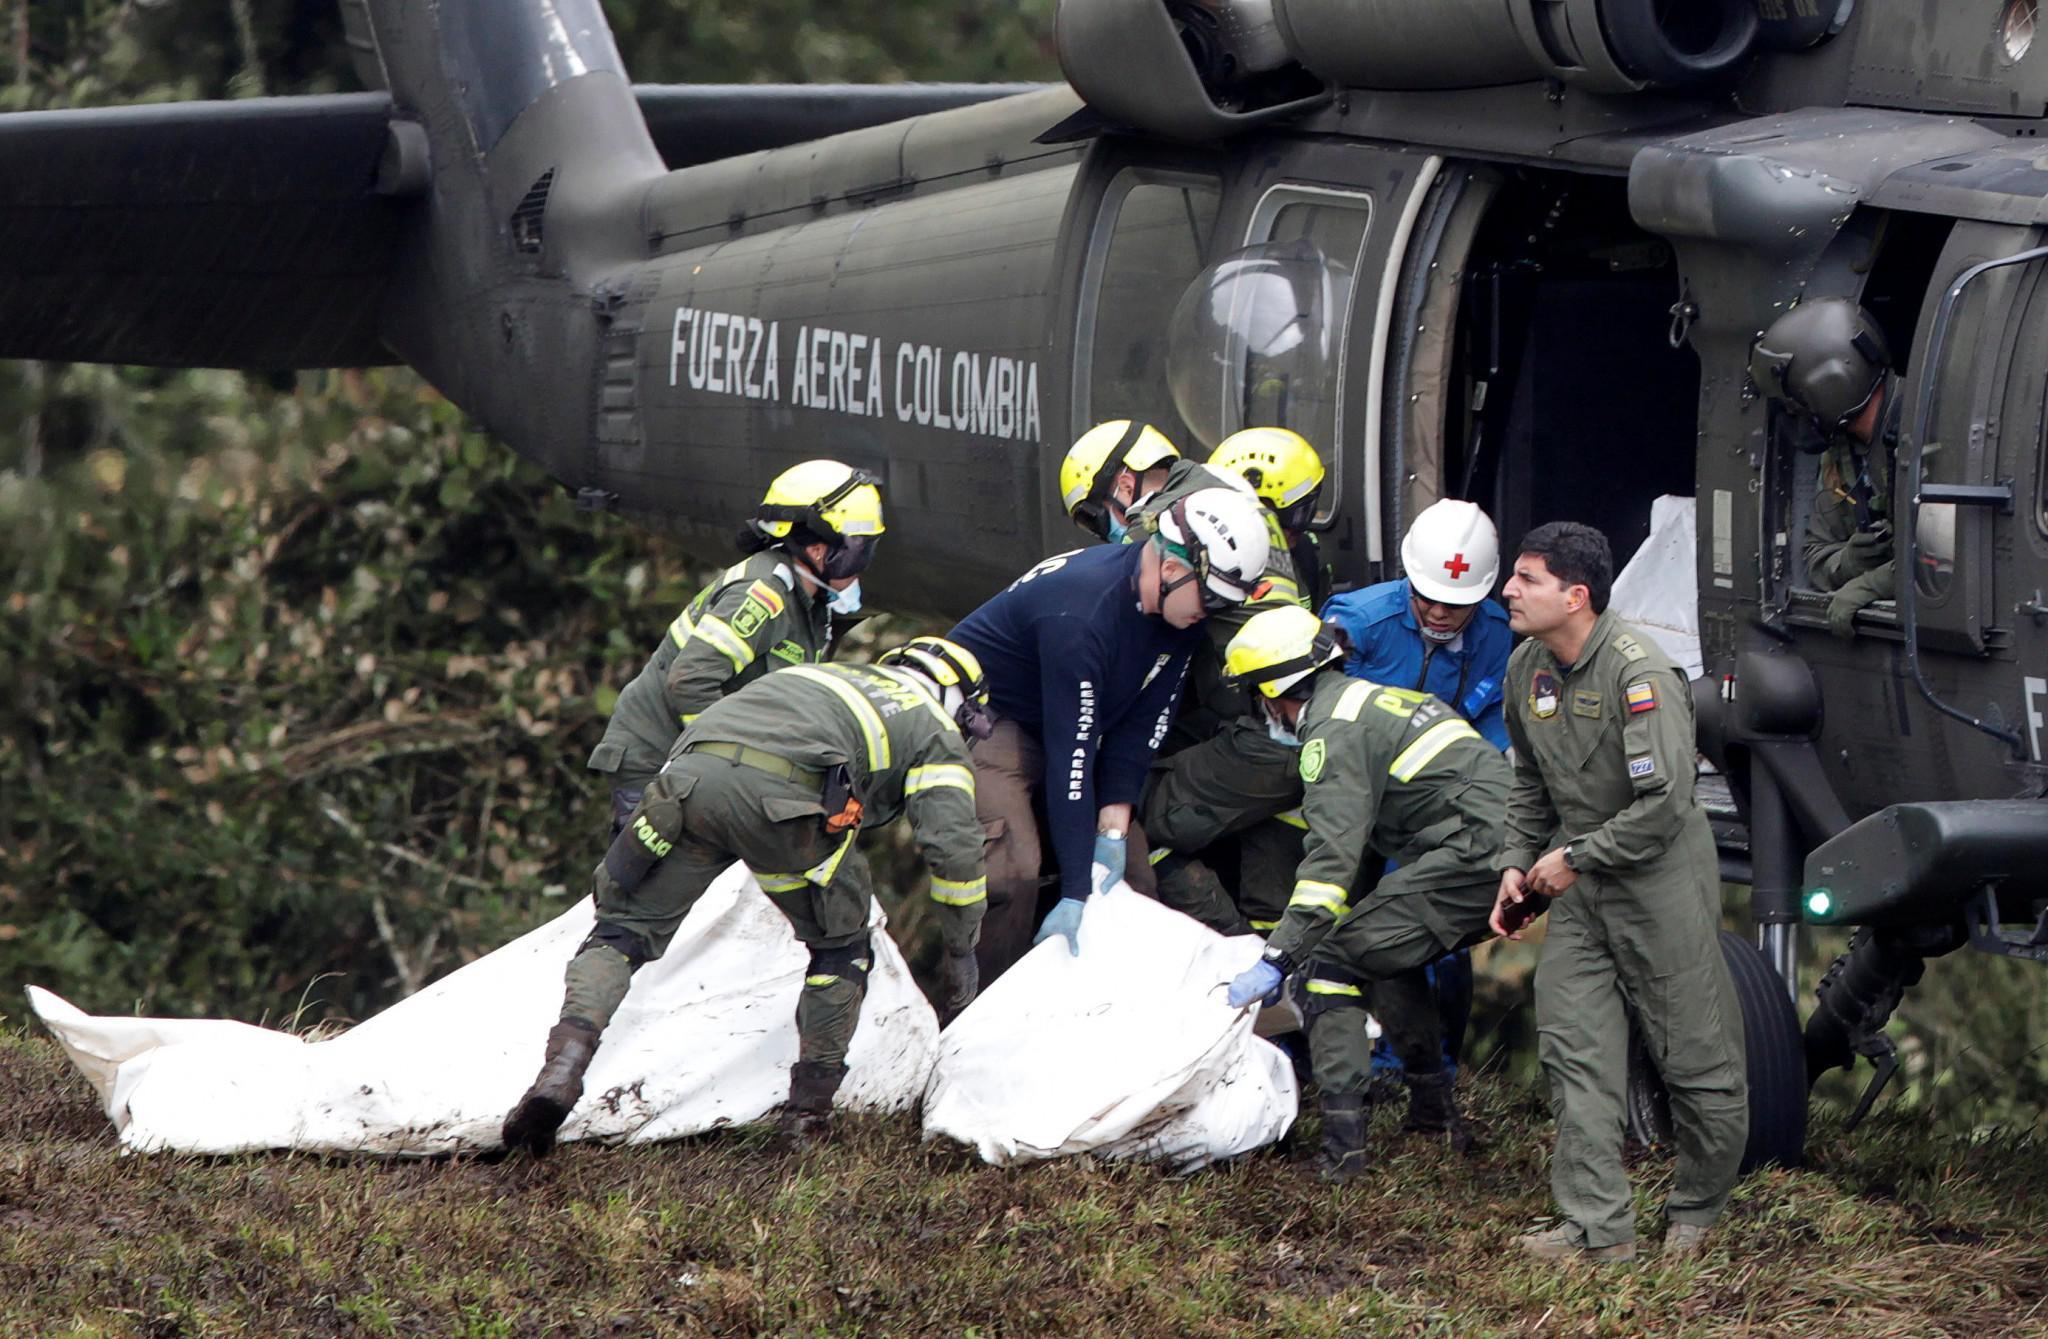 tragodia-aeroporiko-dustixima-kolomvia-nekroi-1300-1 71 είναι οι νεκροί από την αεροπορική τραγωδία στην Κολομβία- 4 δεν επιβιβάστηκαν στο αεροπλάνο